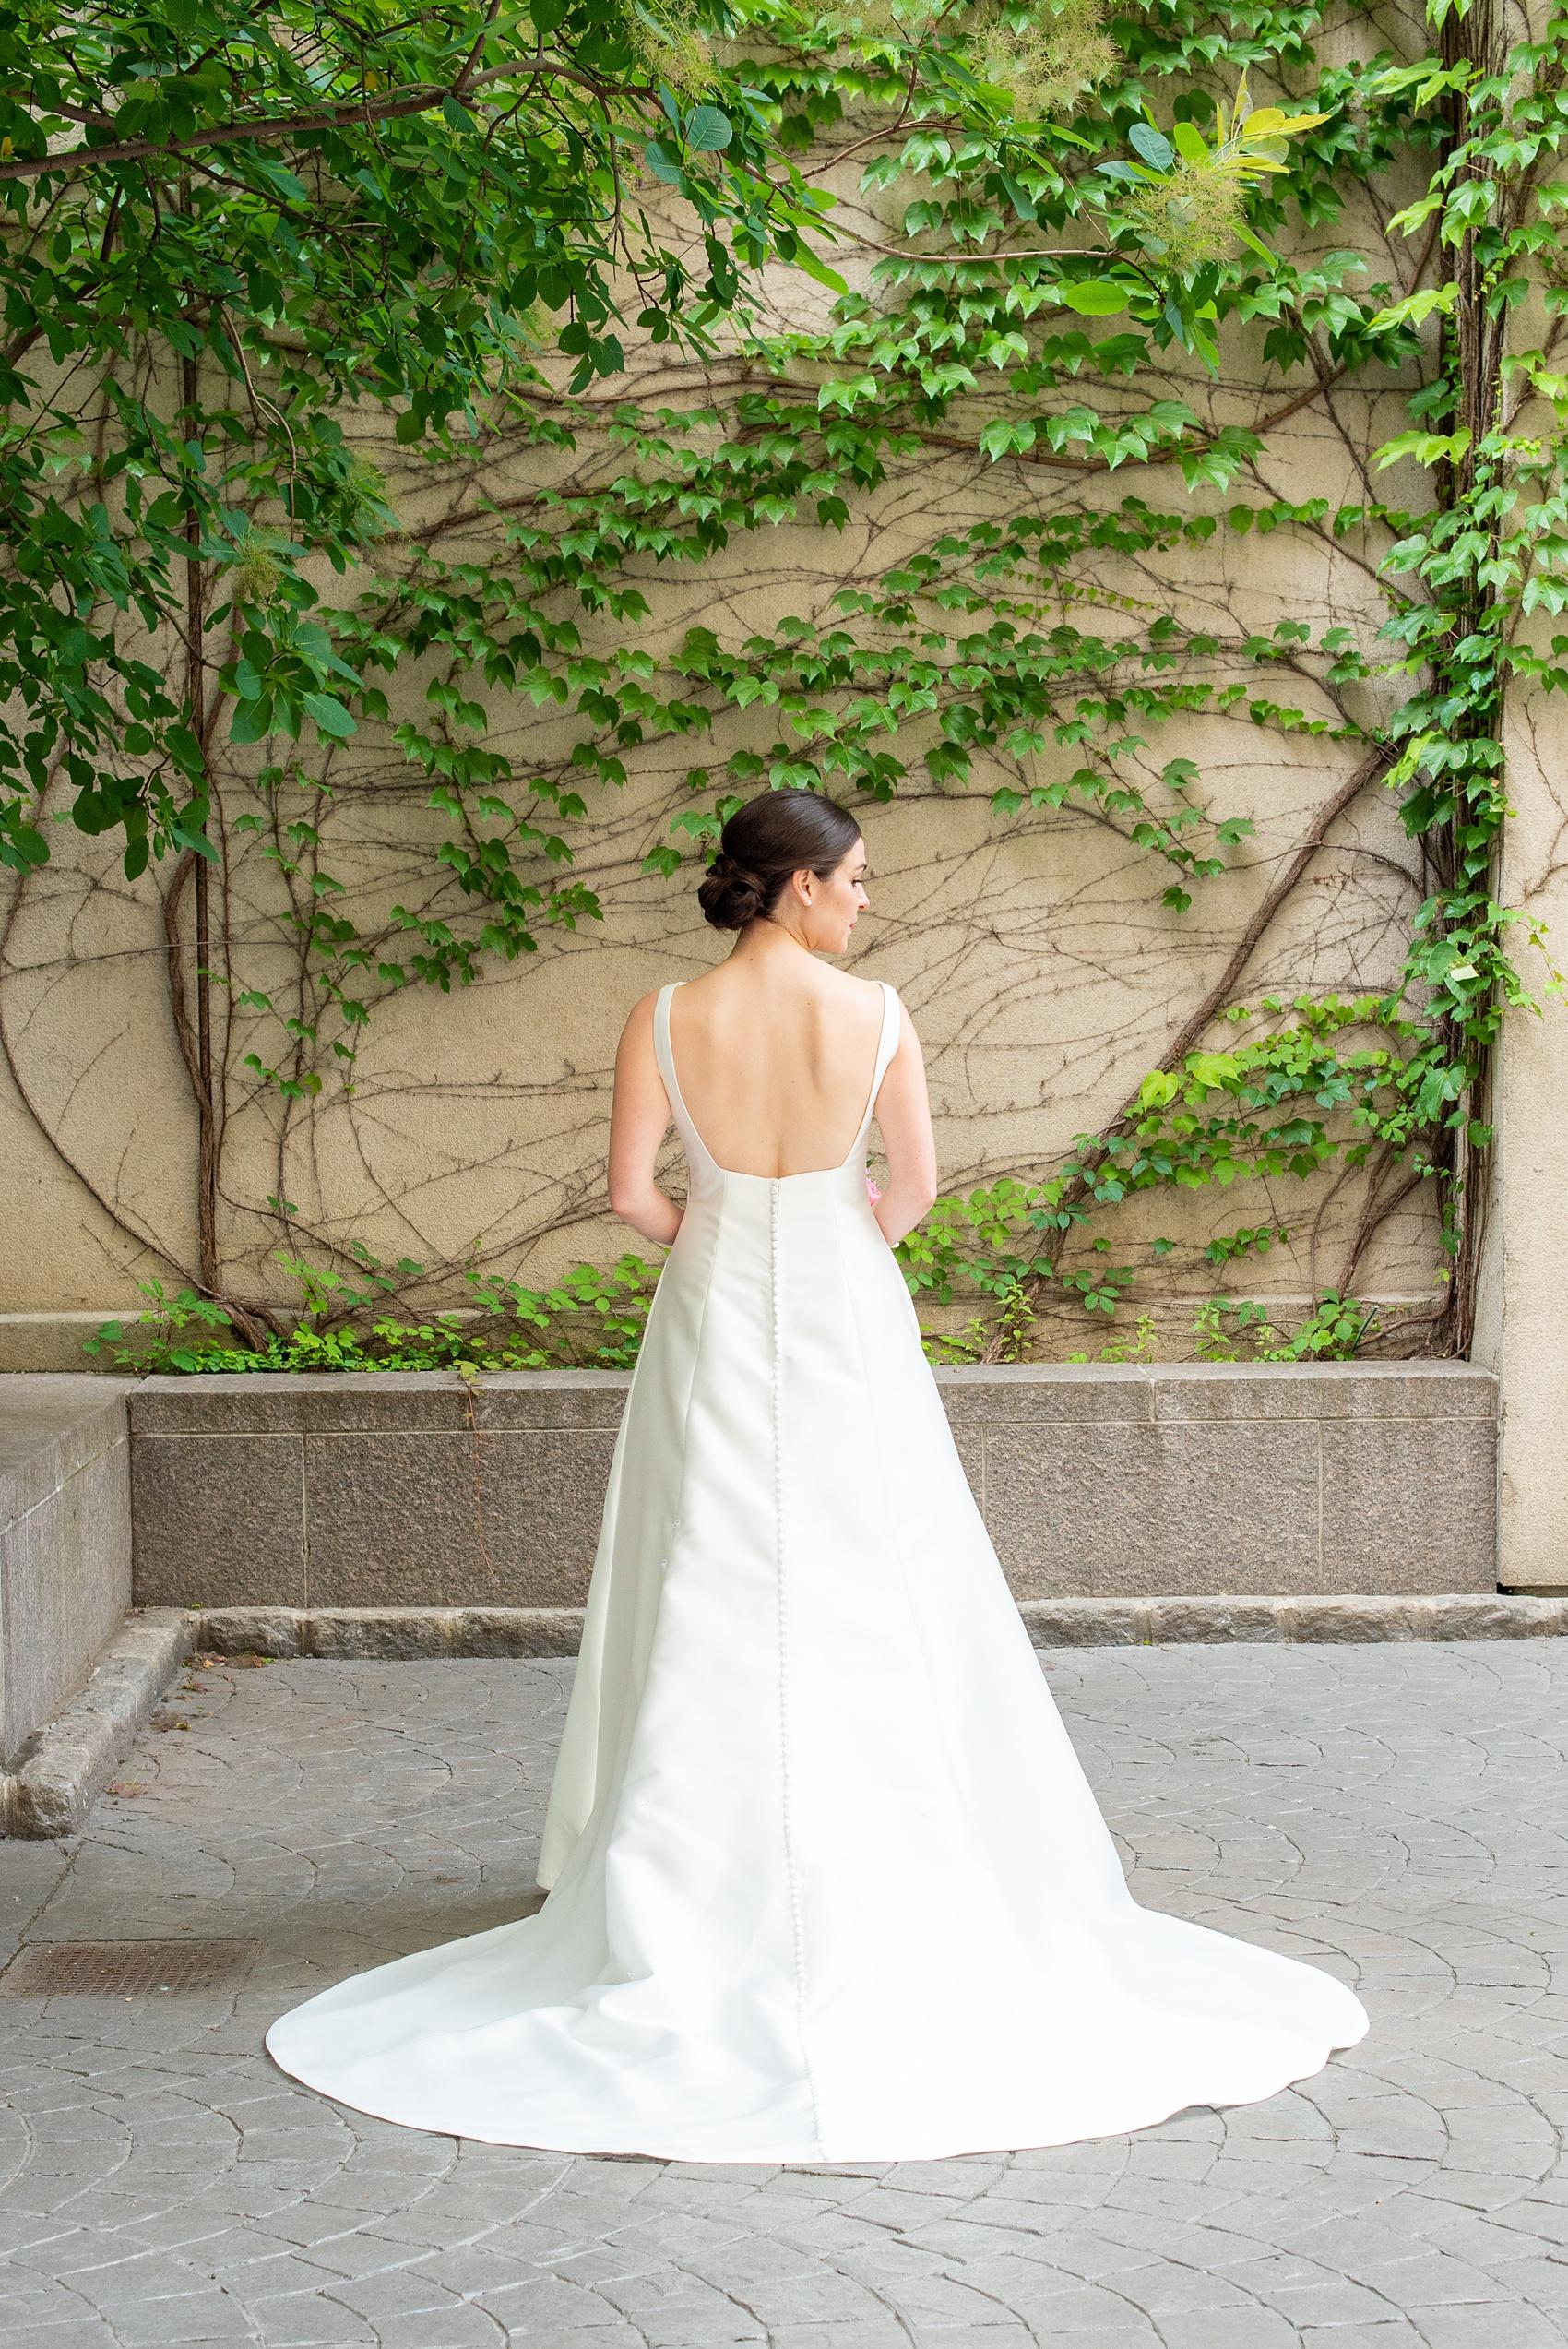 Central Park Wedding Photography: Loeb Boathouse At Central Park Wedding Photos • Missy